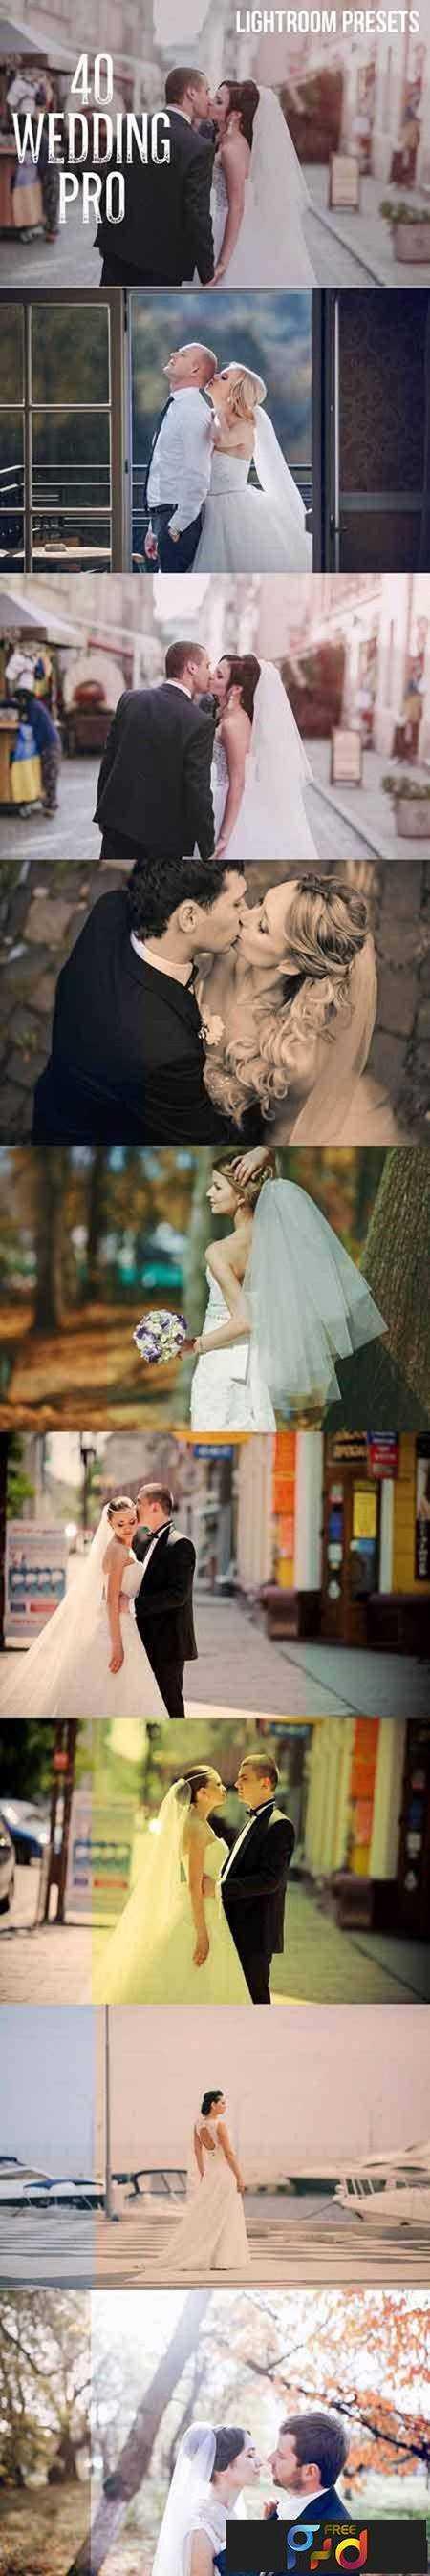 FreePsdVn.com_1702290_LIGHTROOM_40_wedding_pro_lightroom_presets_966448